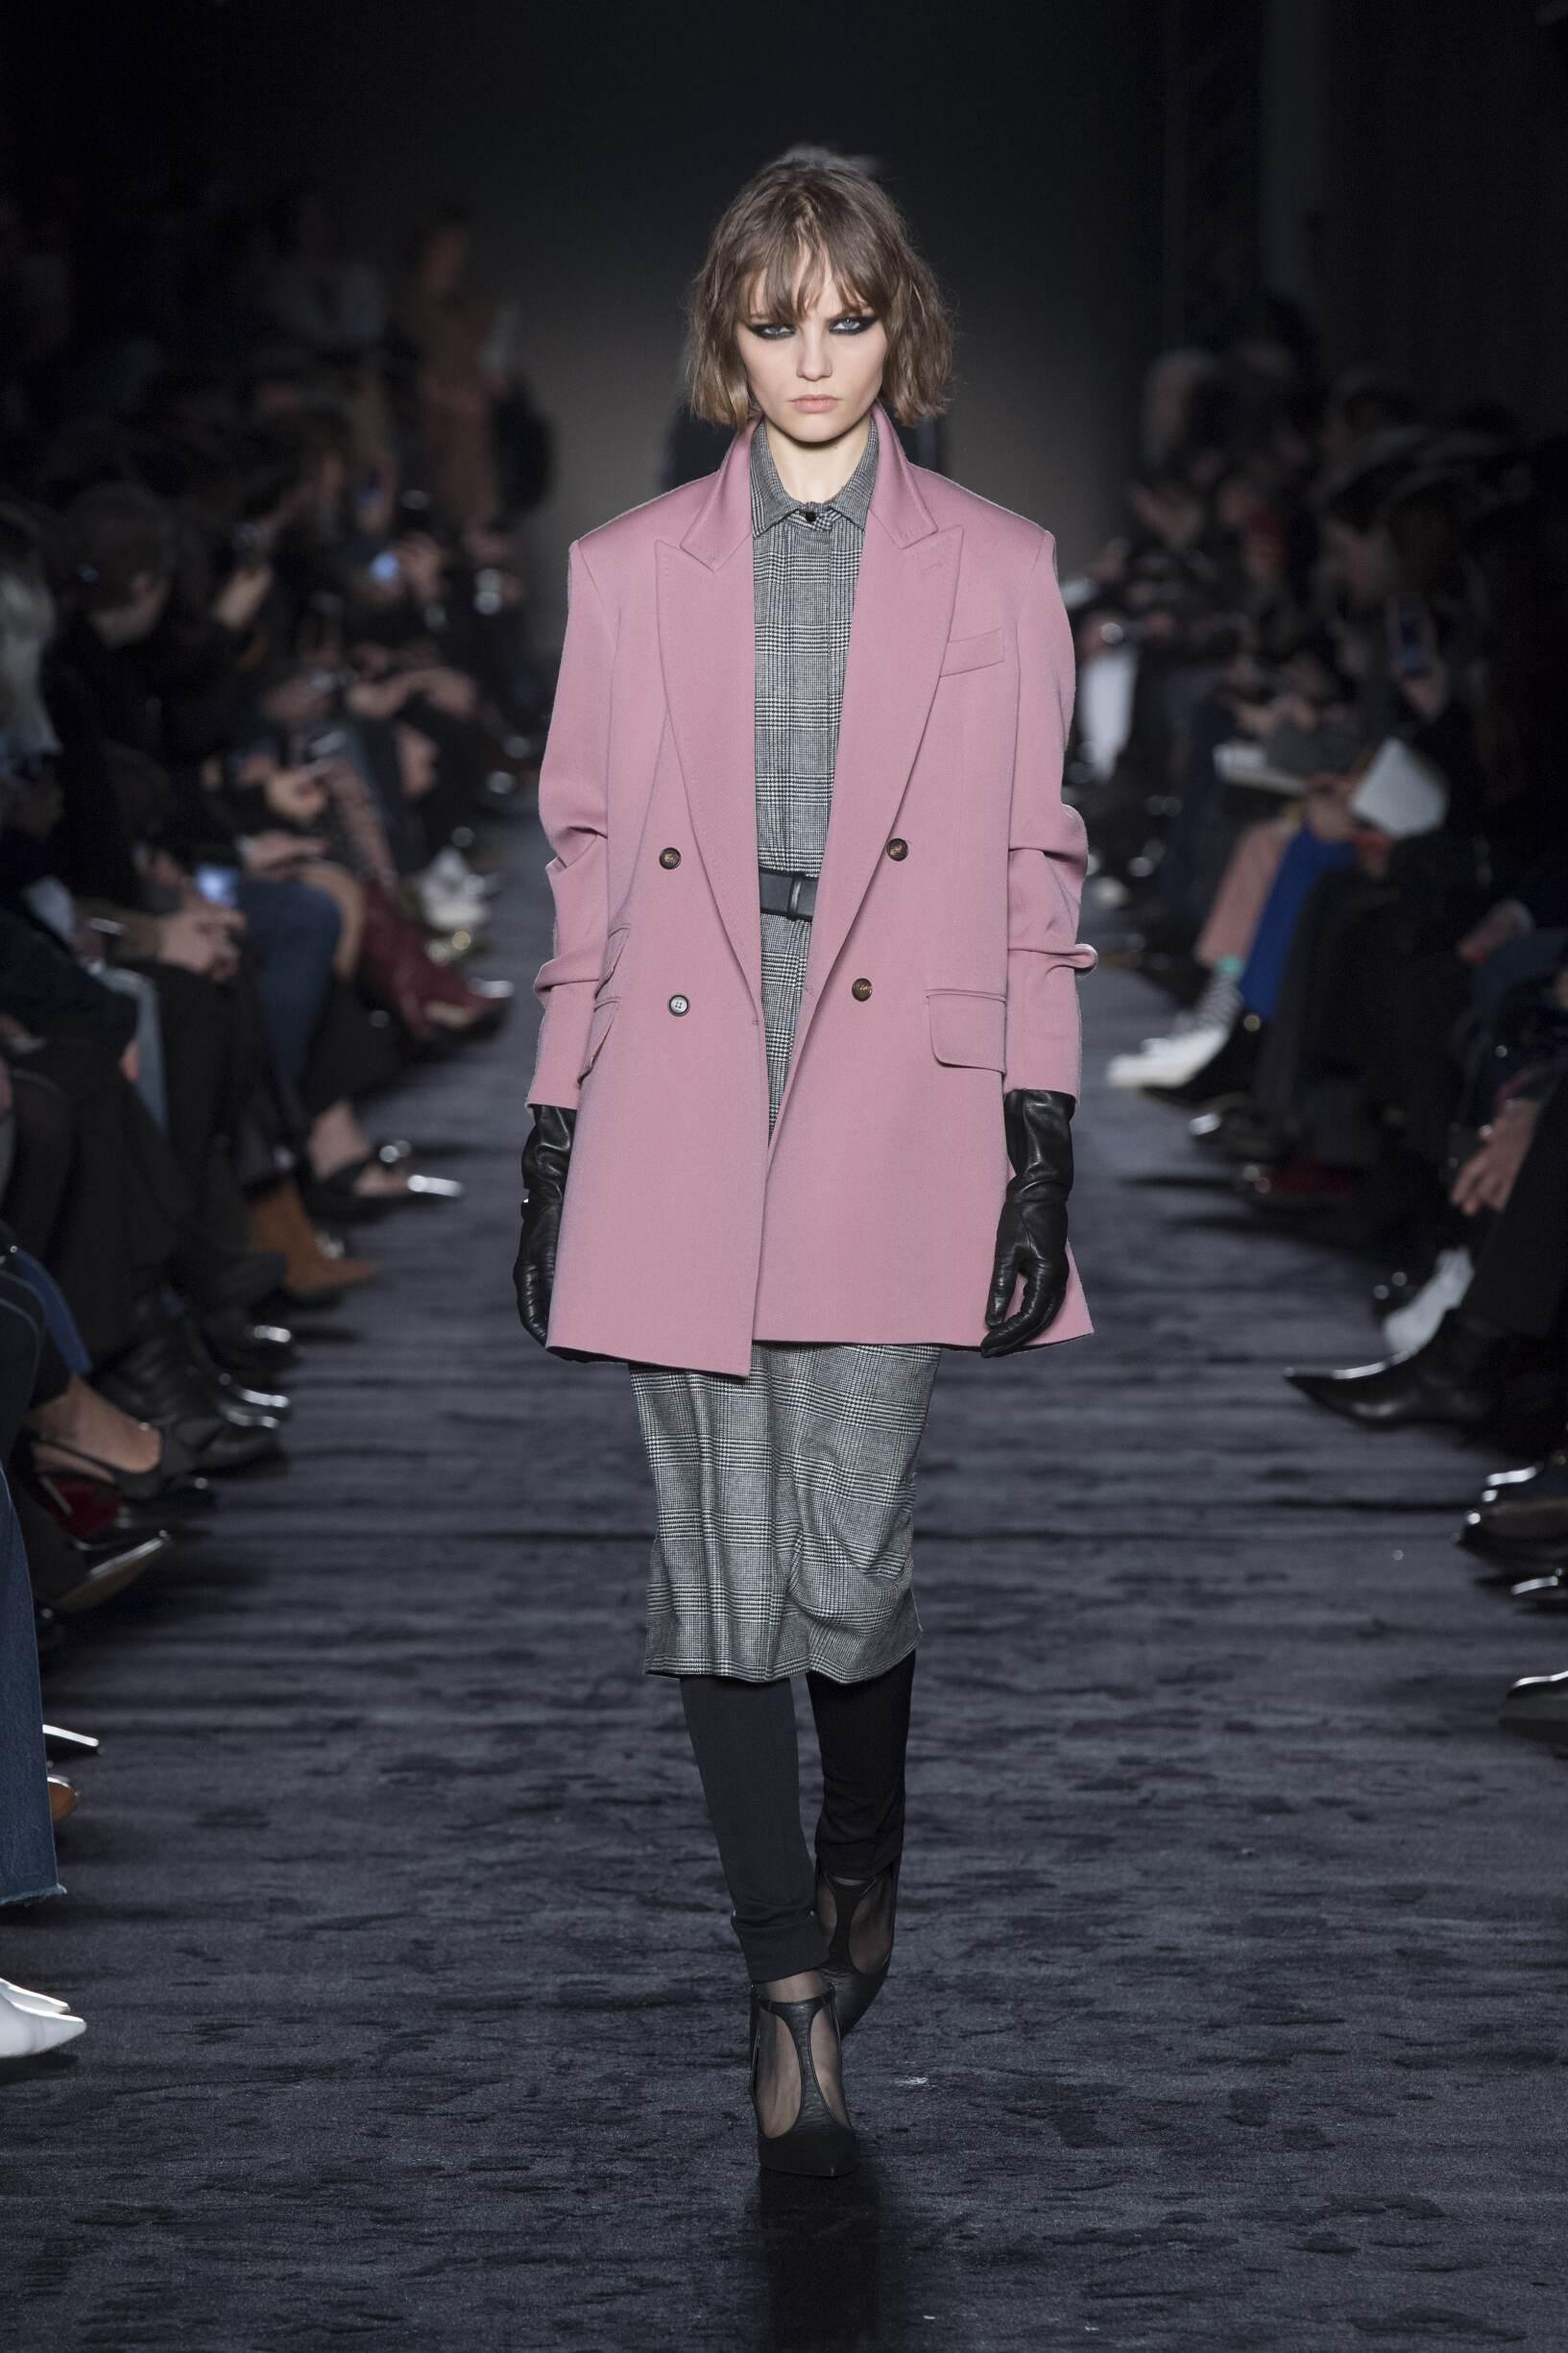 Fall Fashion Woman Trends 2018 Max Mara